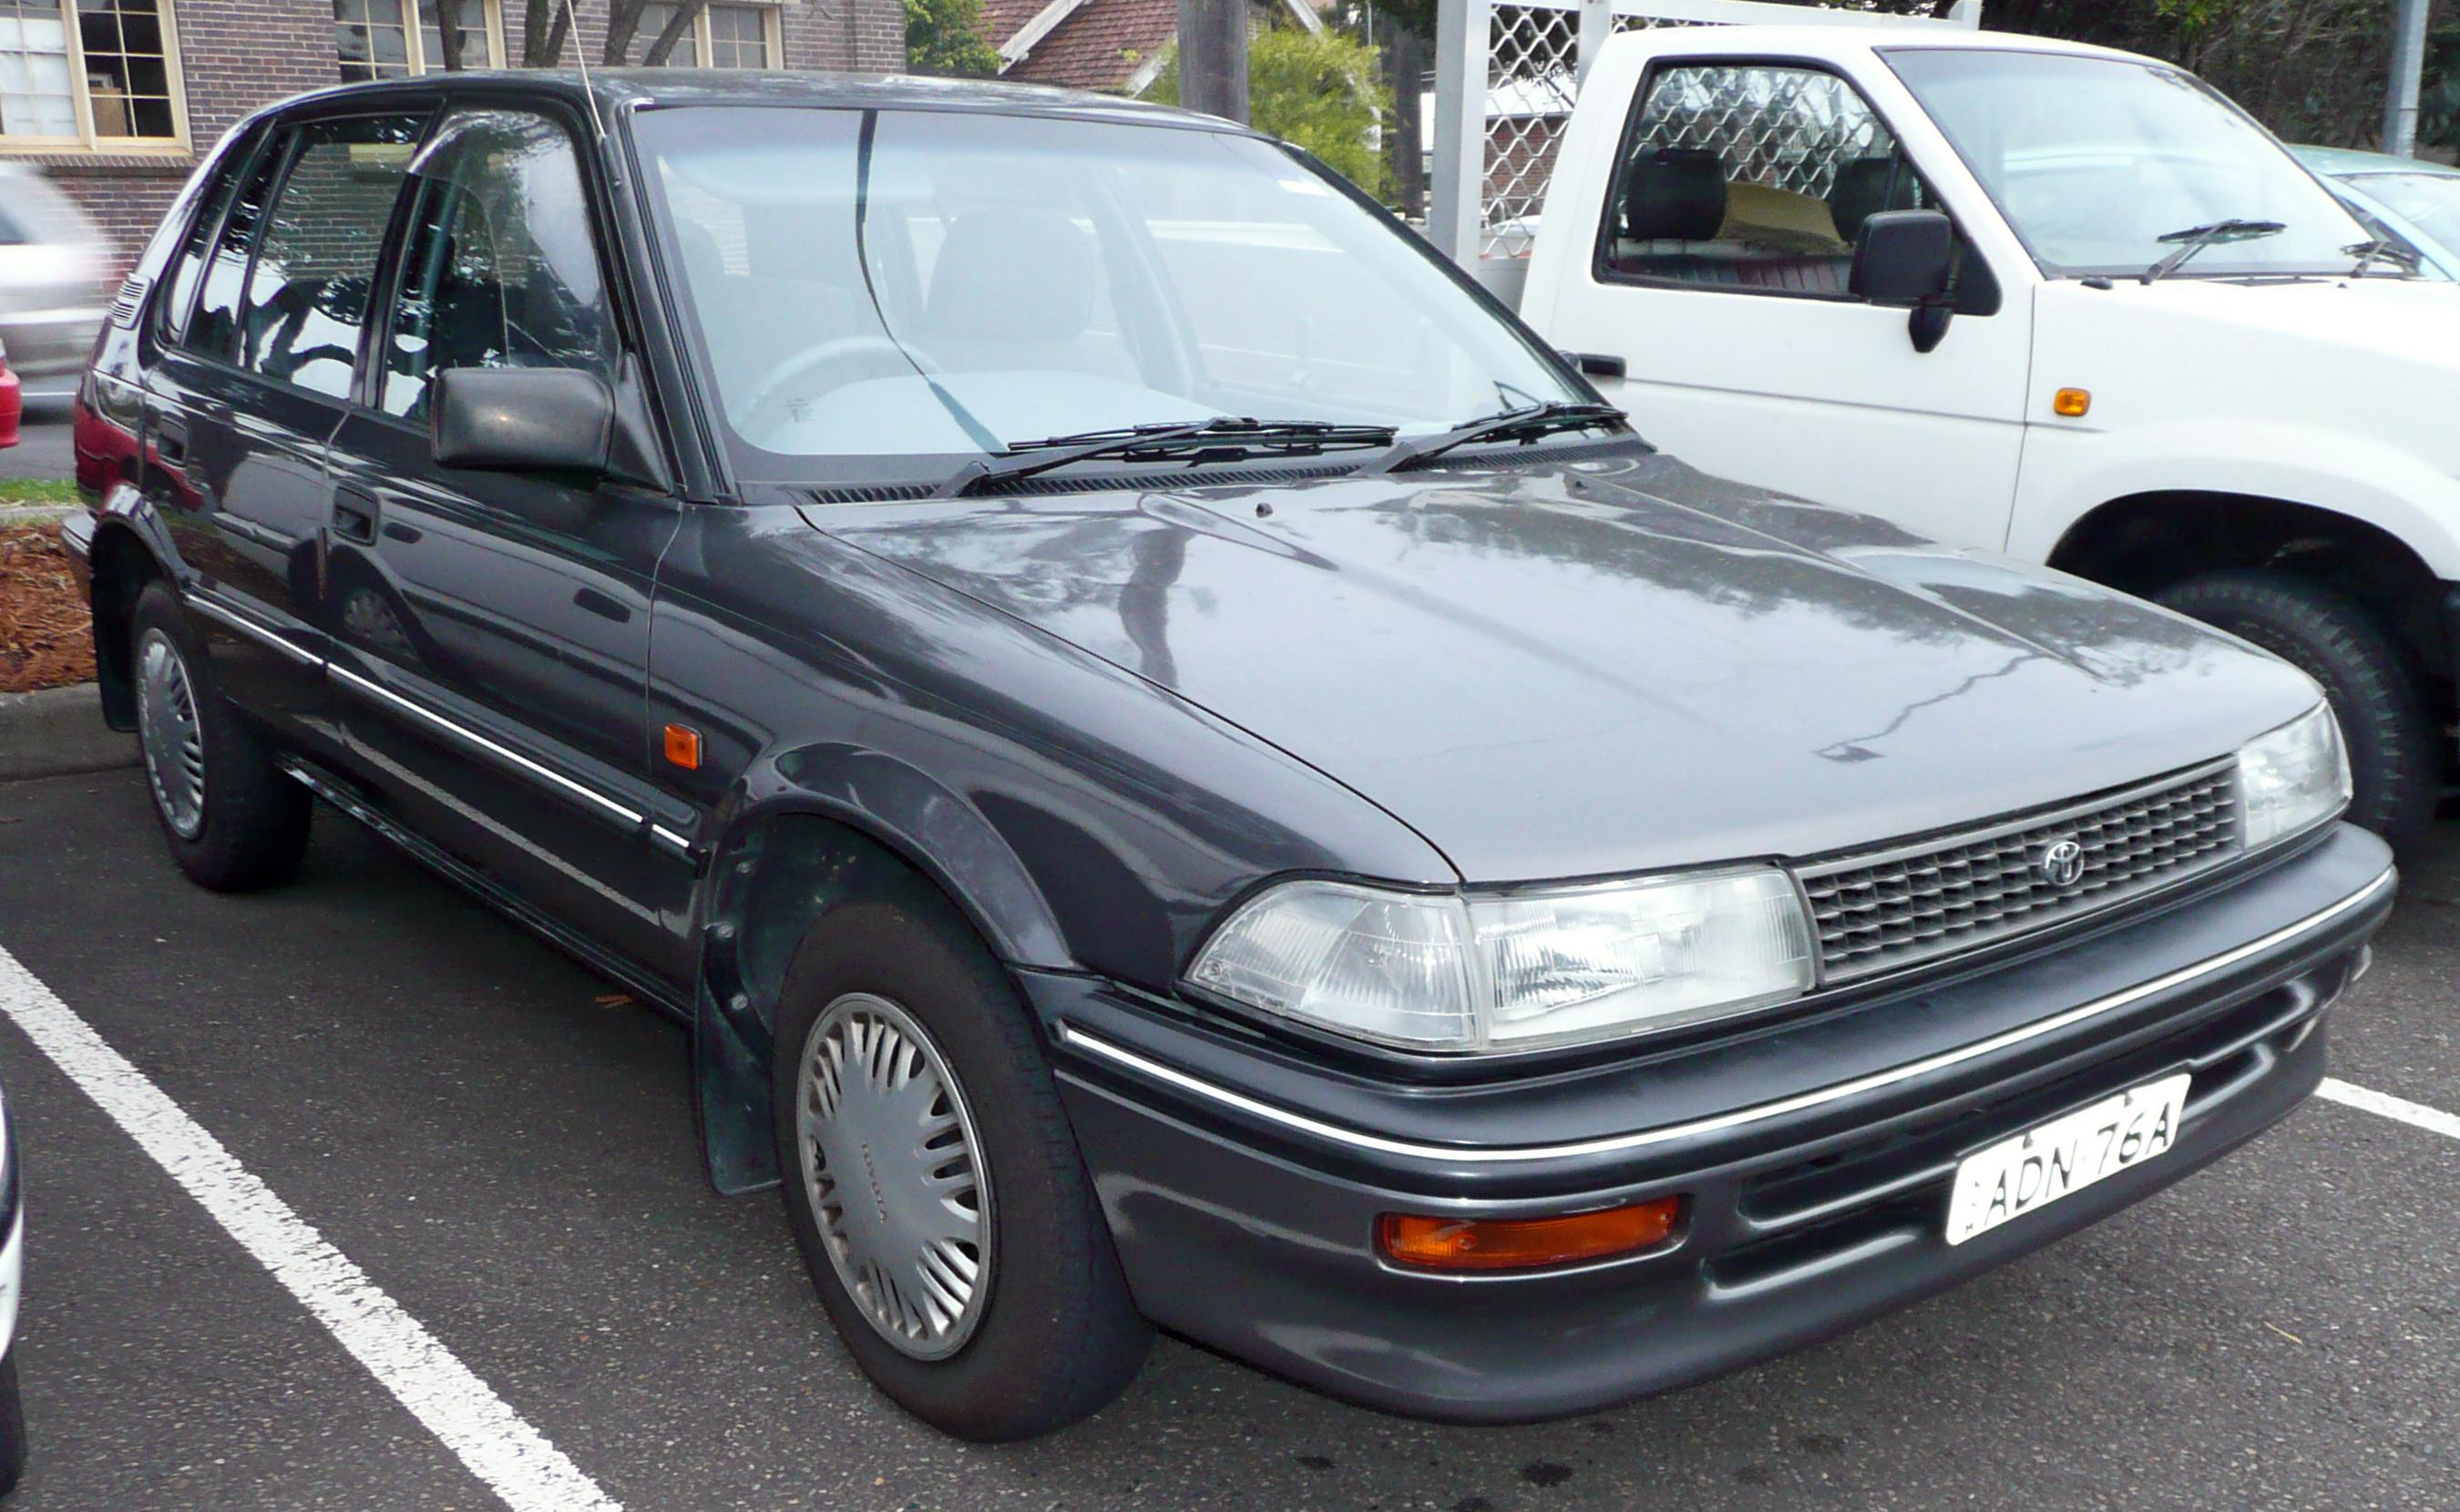 toyota corolla vii e100 1991 2002 hatchback 5 door rh carsot com 1992 toyota corolla manual pdf 1991 toyota corolla manual transmission